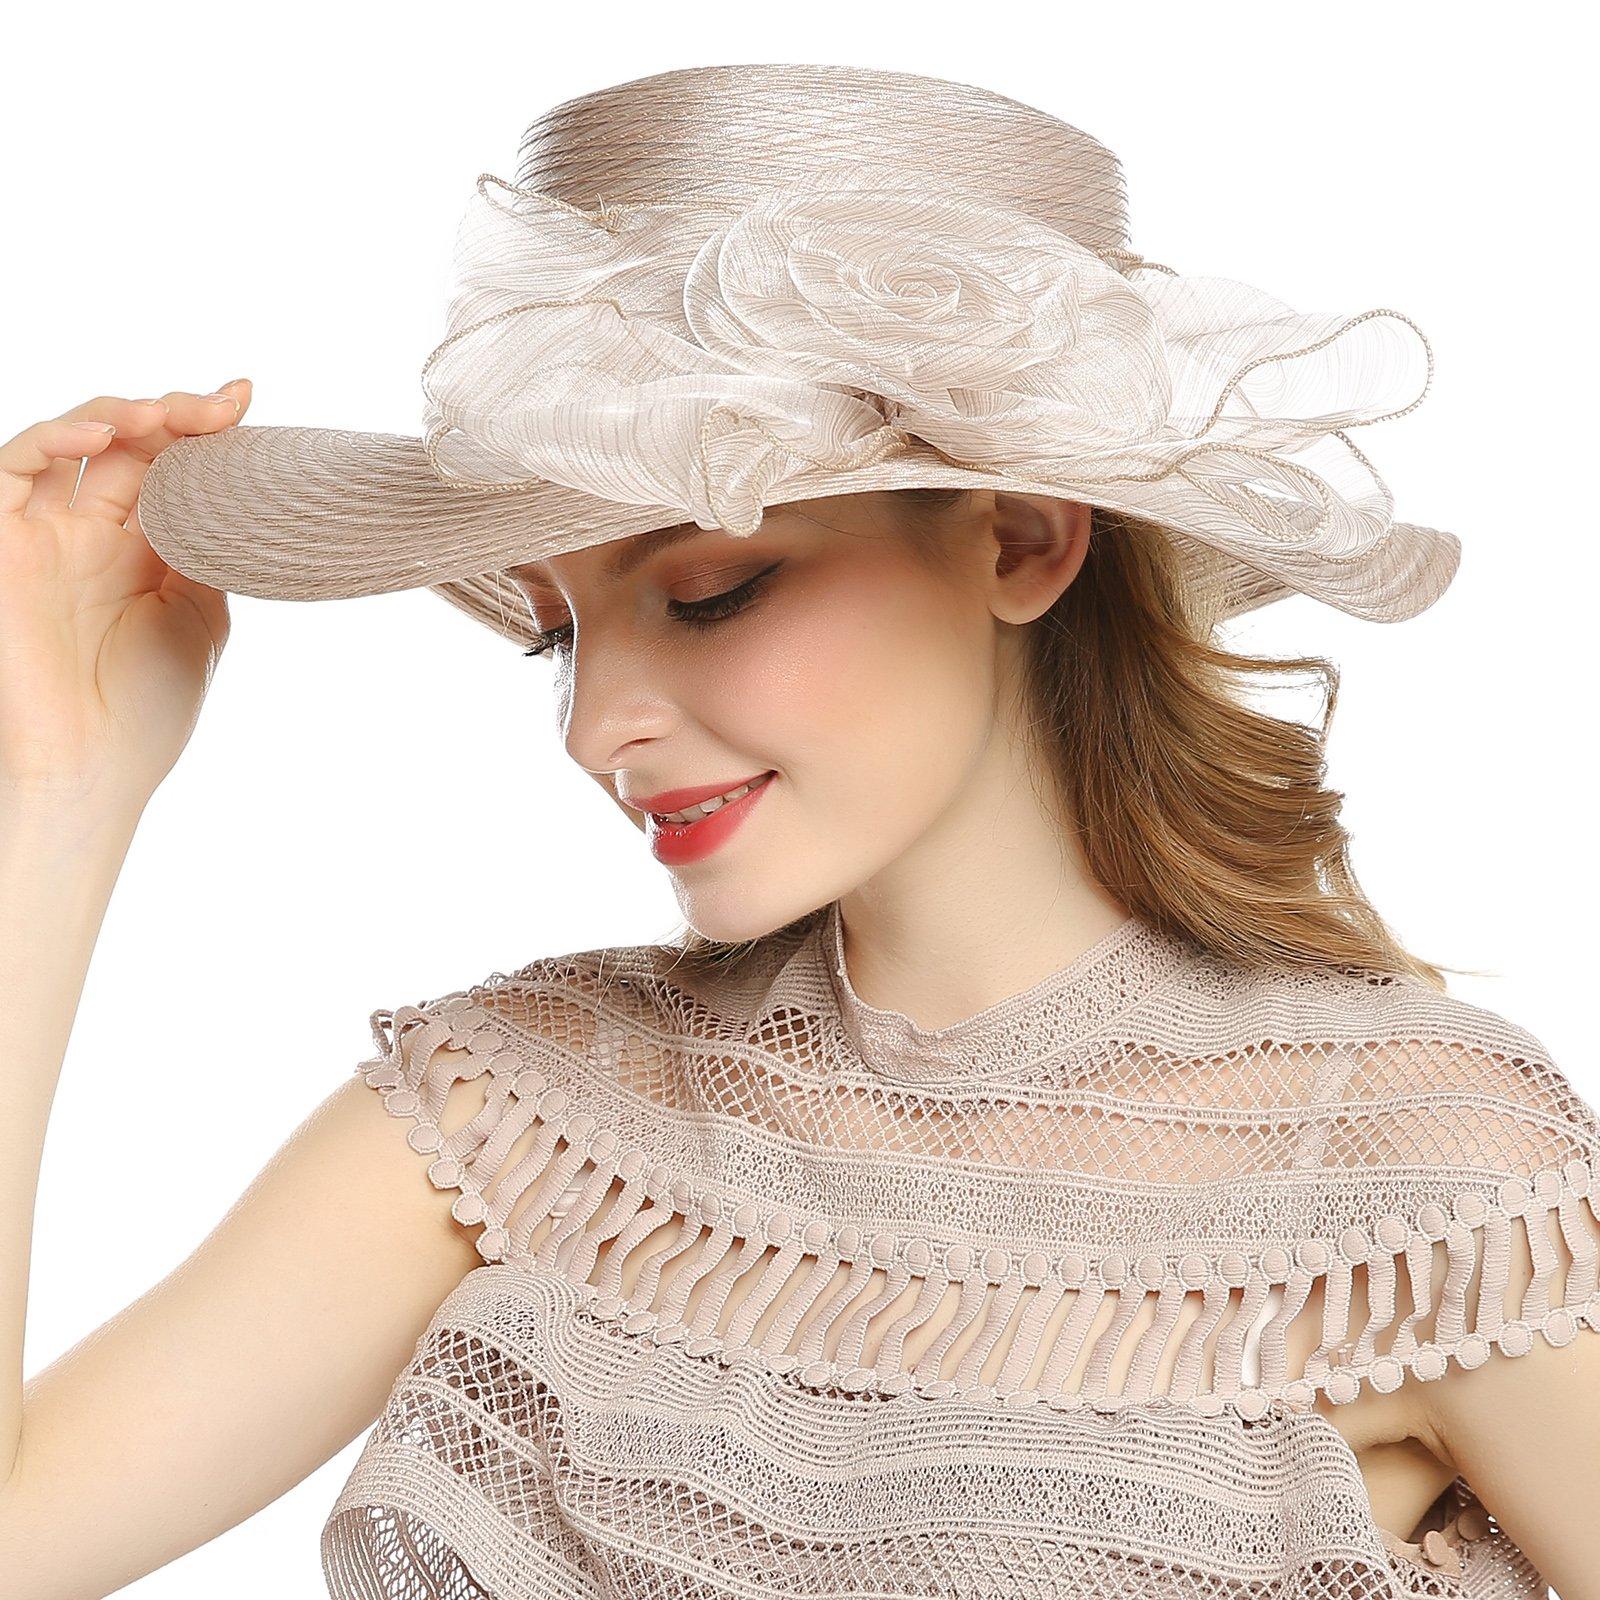 WELROG Women's Derby Church Dress Hat - Wide Brim Floppy Floral Ribbon UPF Protection Wedding Sun Hats(Khaki)